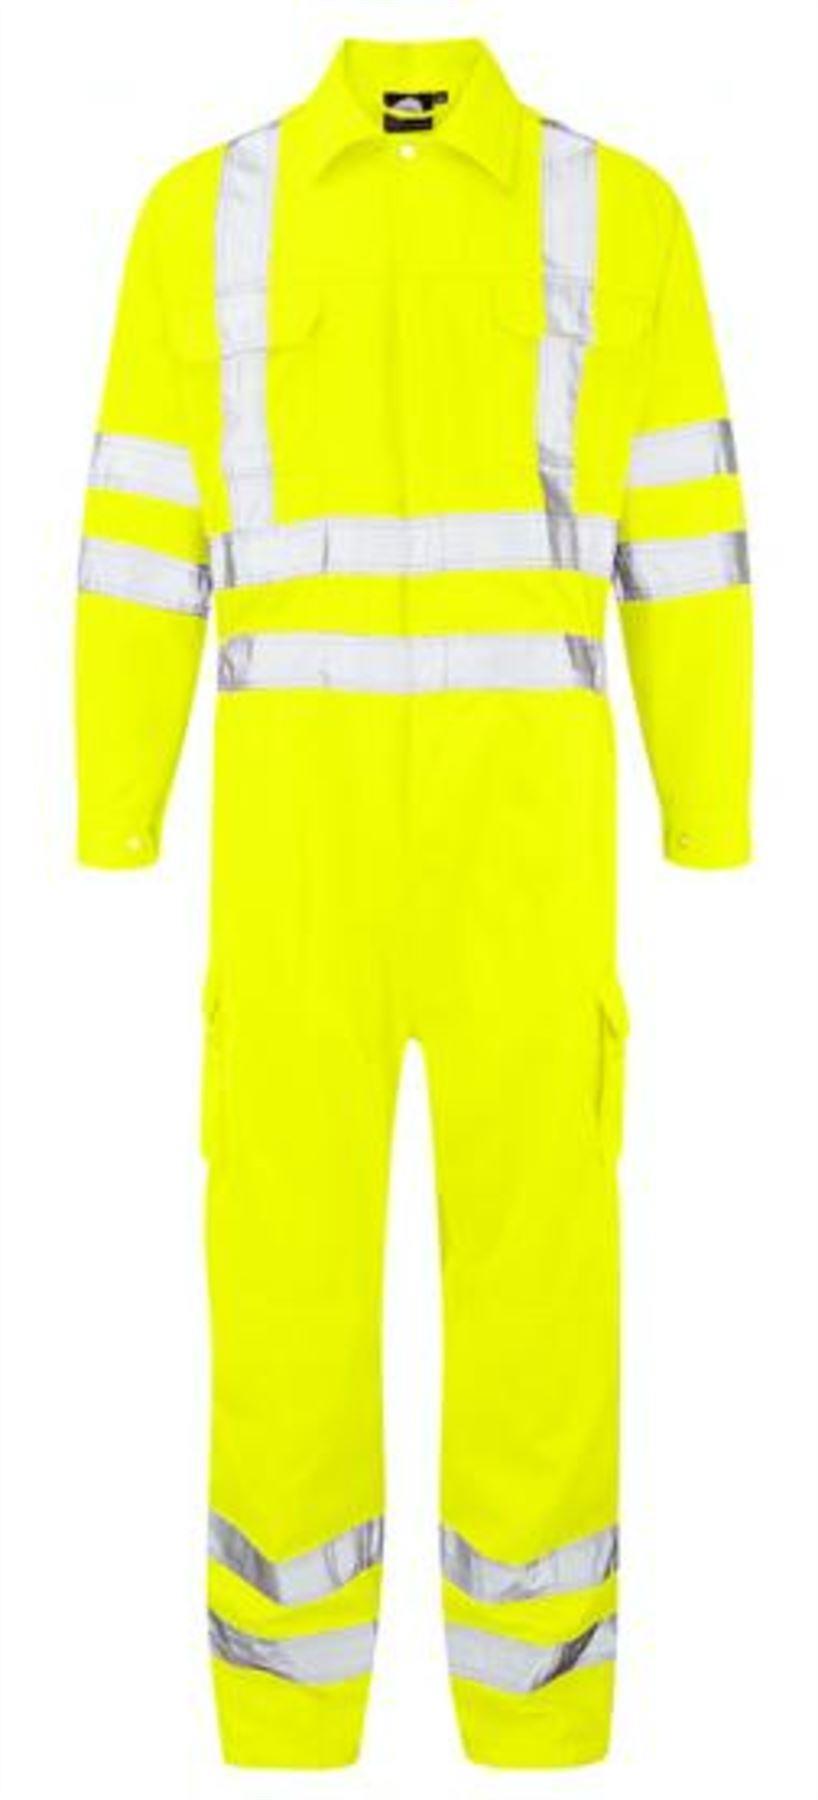 Orn Shrike Hi Vis Overall - Yellow 4XL32L